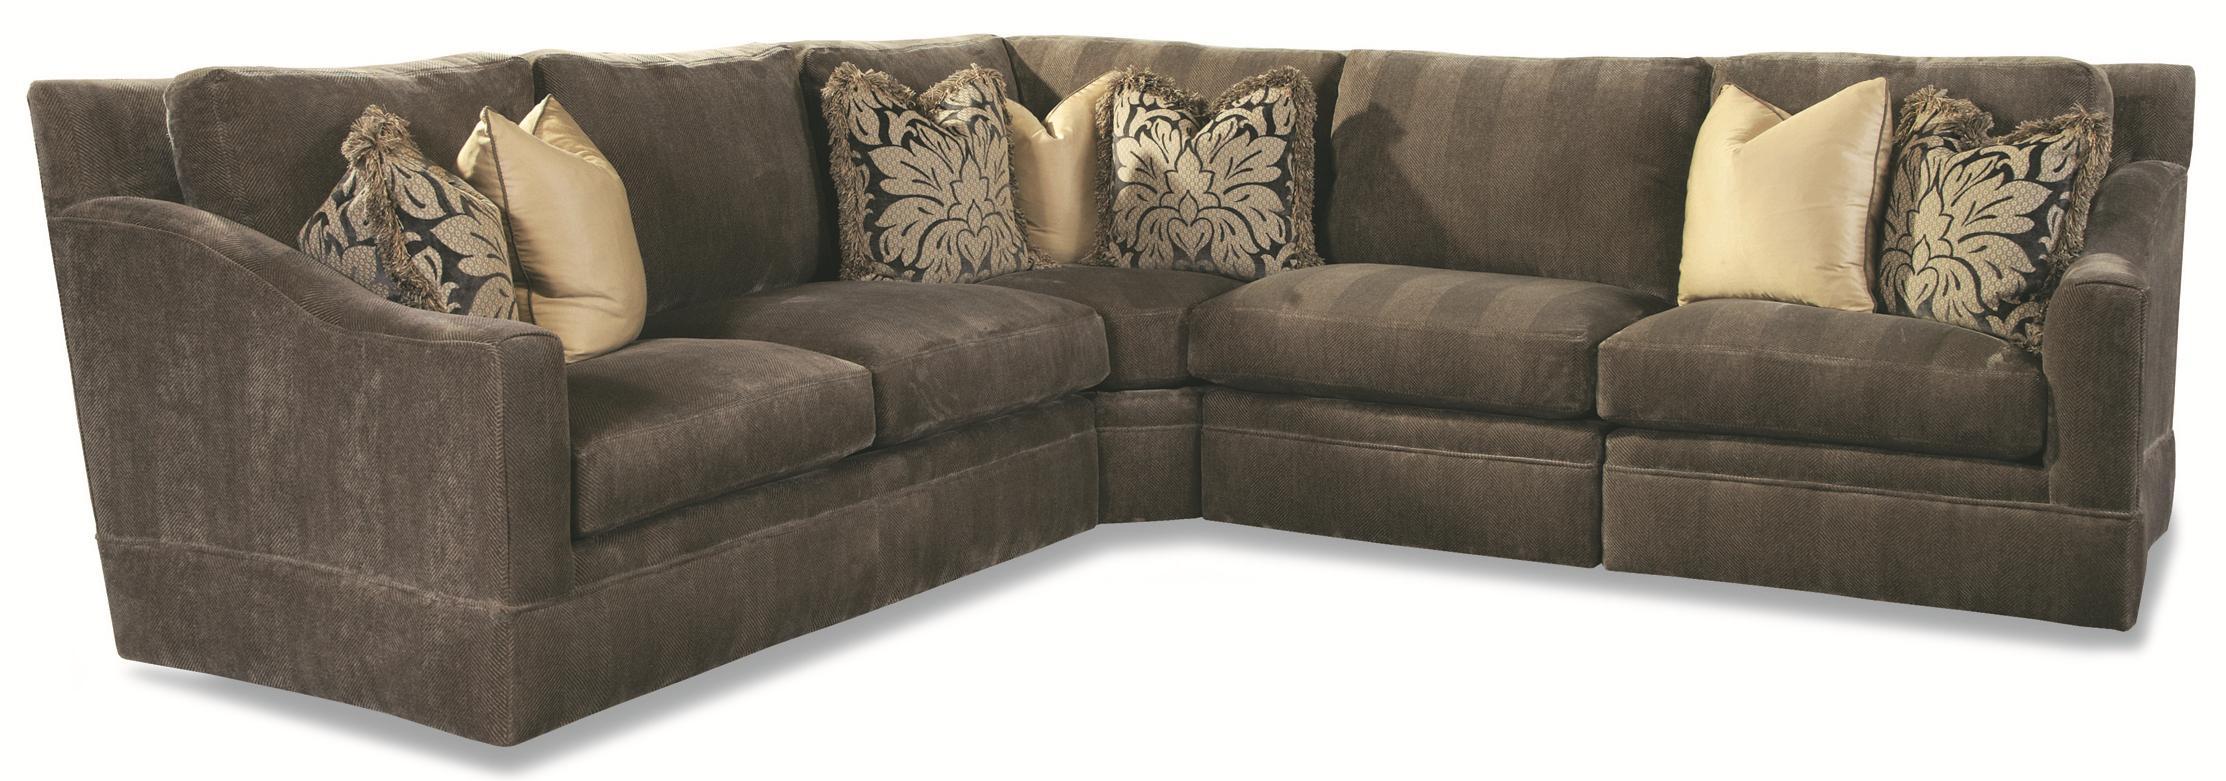 7204 Sectional by Geoffrey Alexander at Sprintz Furniture